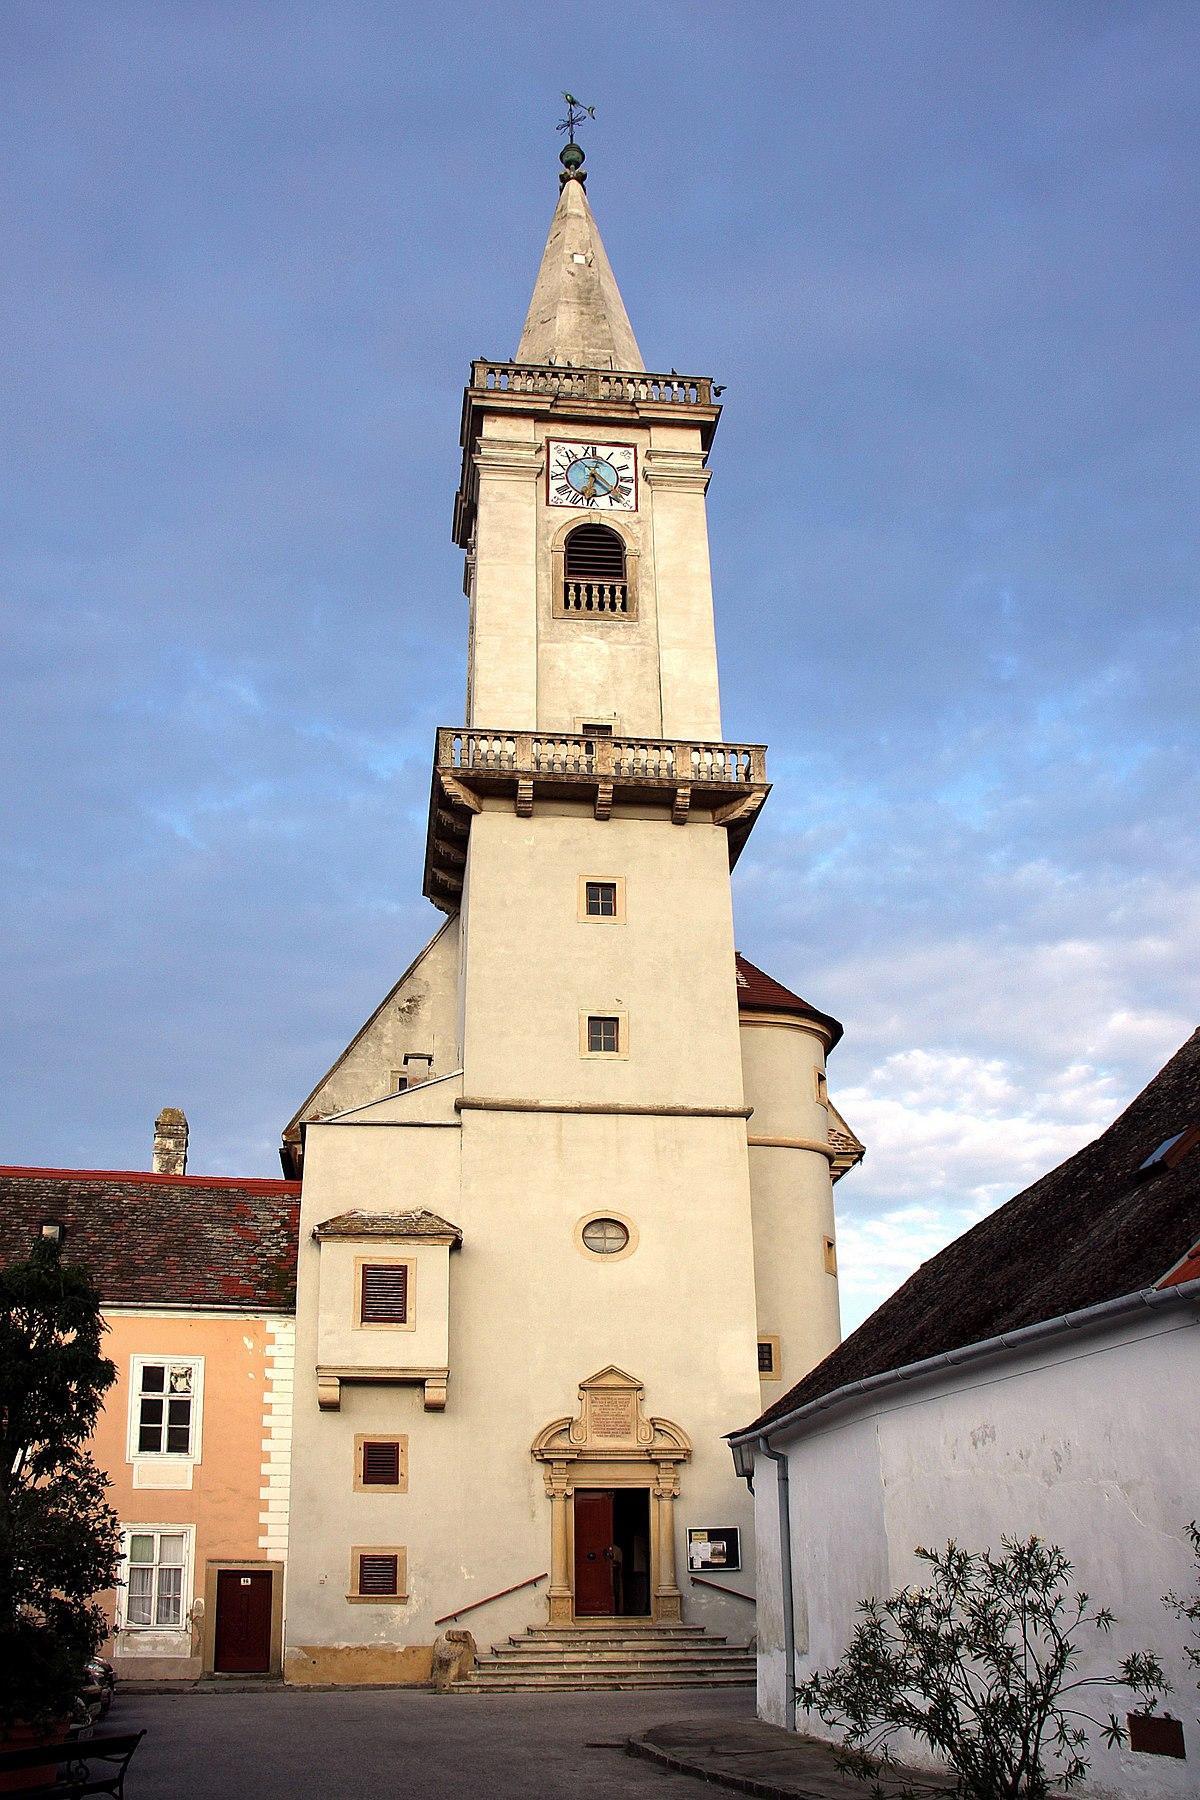 Katholische Pfarrkirche Rust am See – Wikipedia